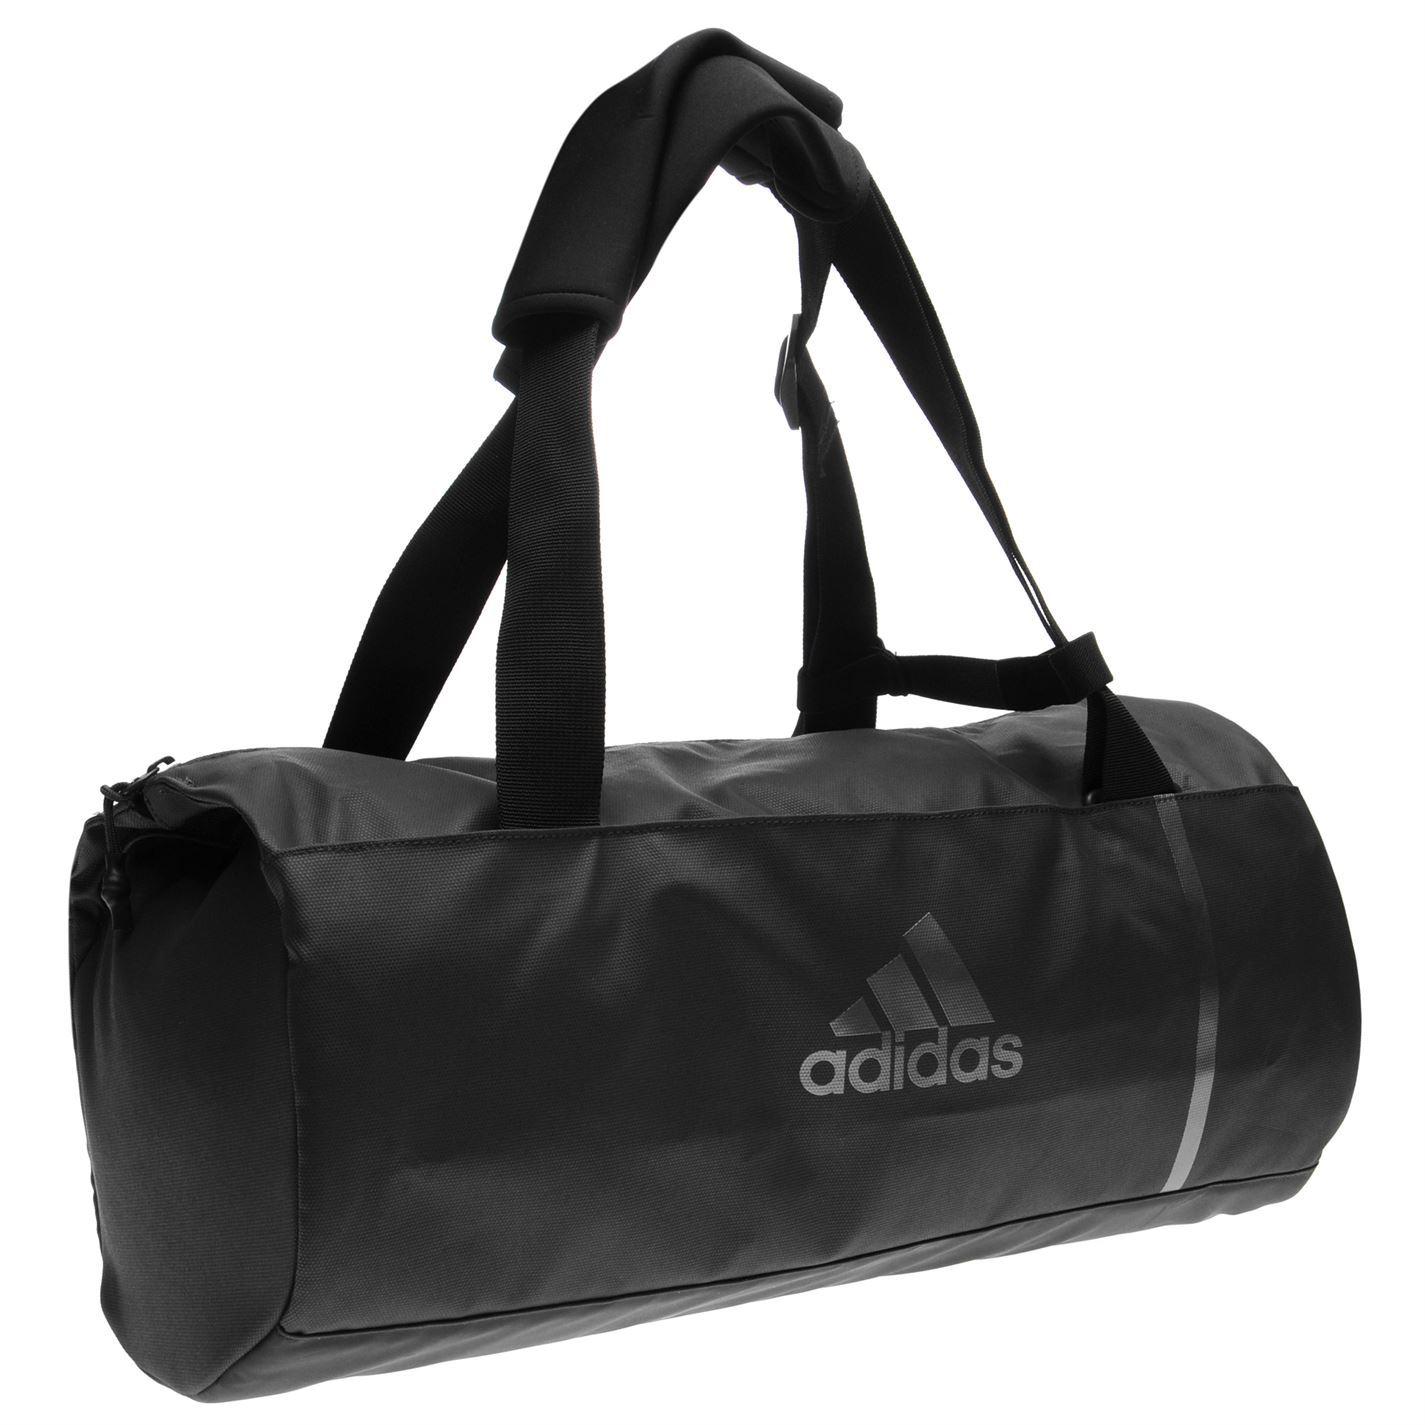 buy popular 2bfce 5f5b9 Sportive Adidas Trasportatore Borsa Borsone Borse FanwaEq7